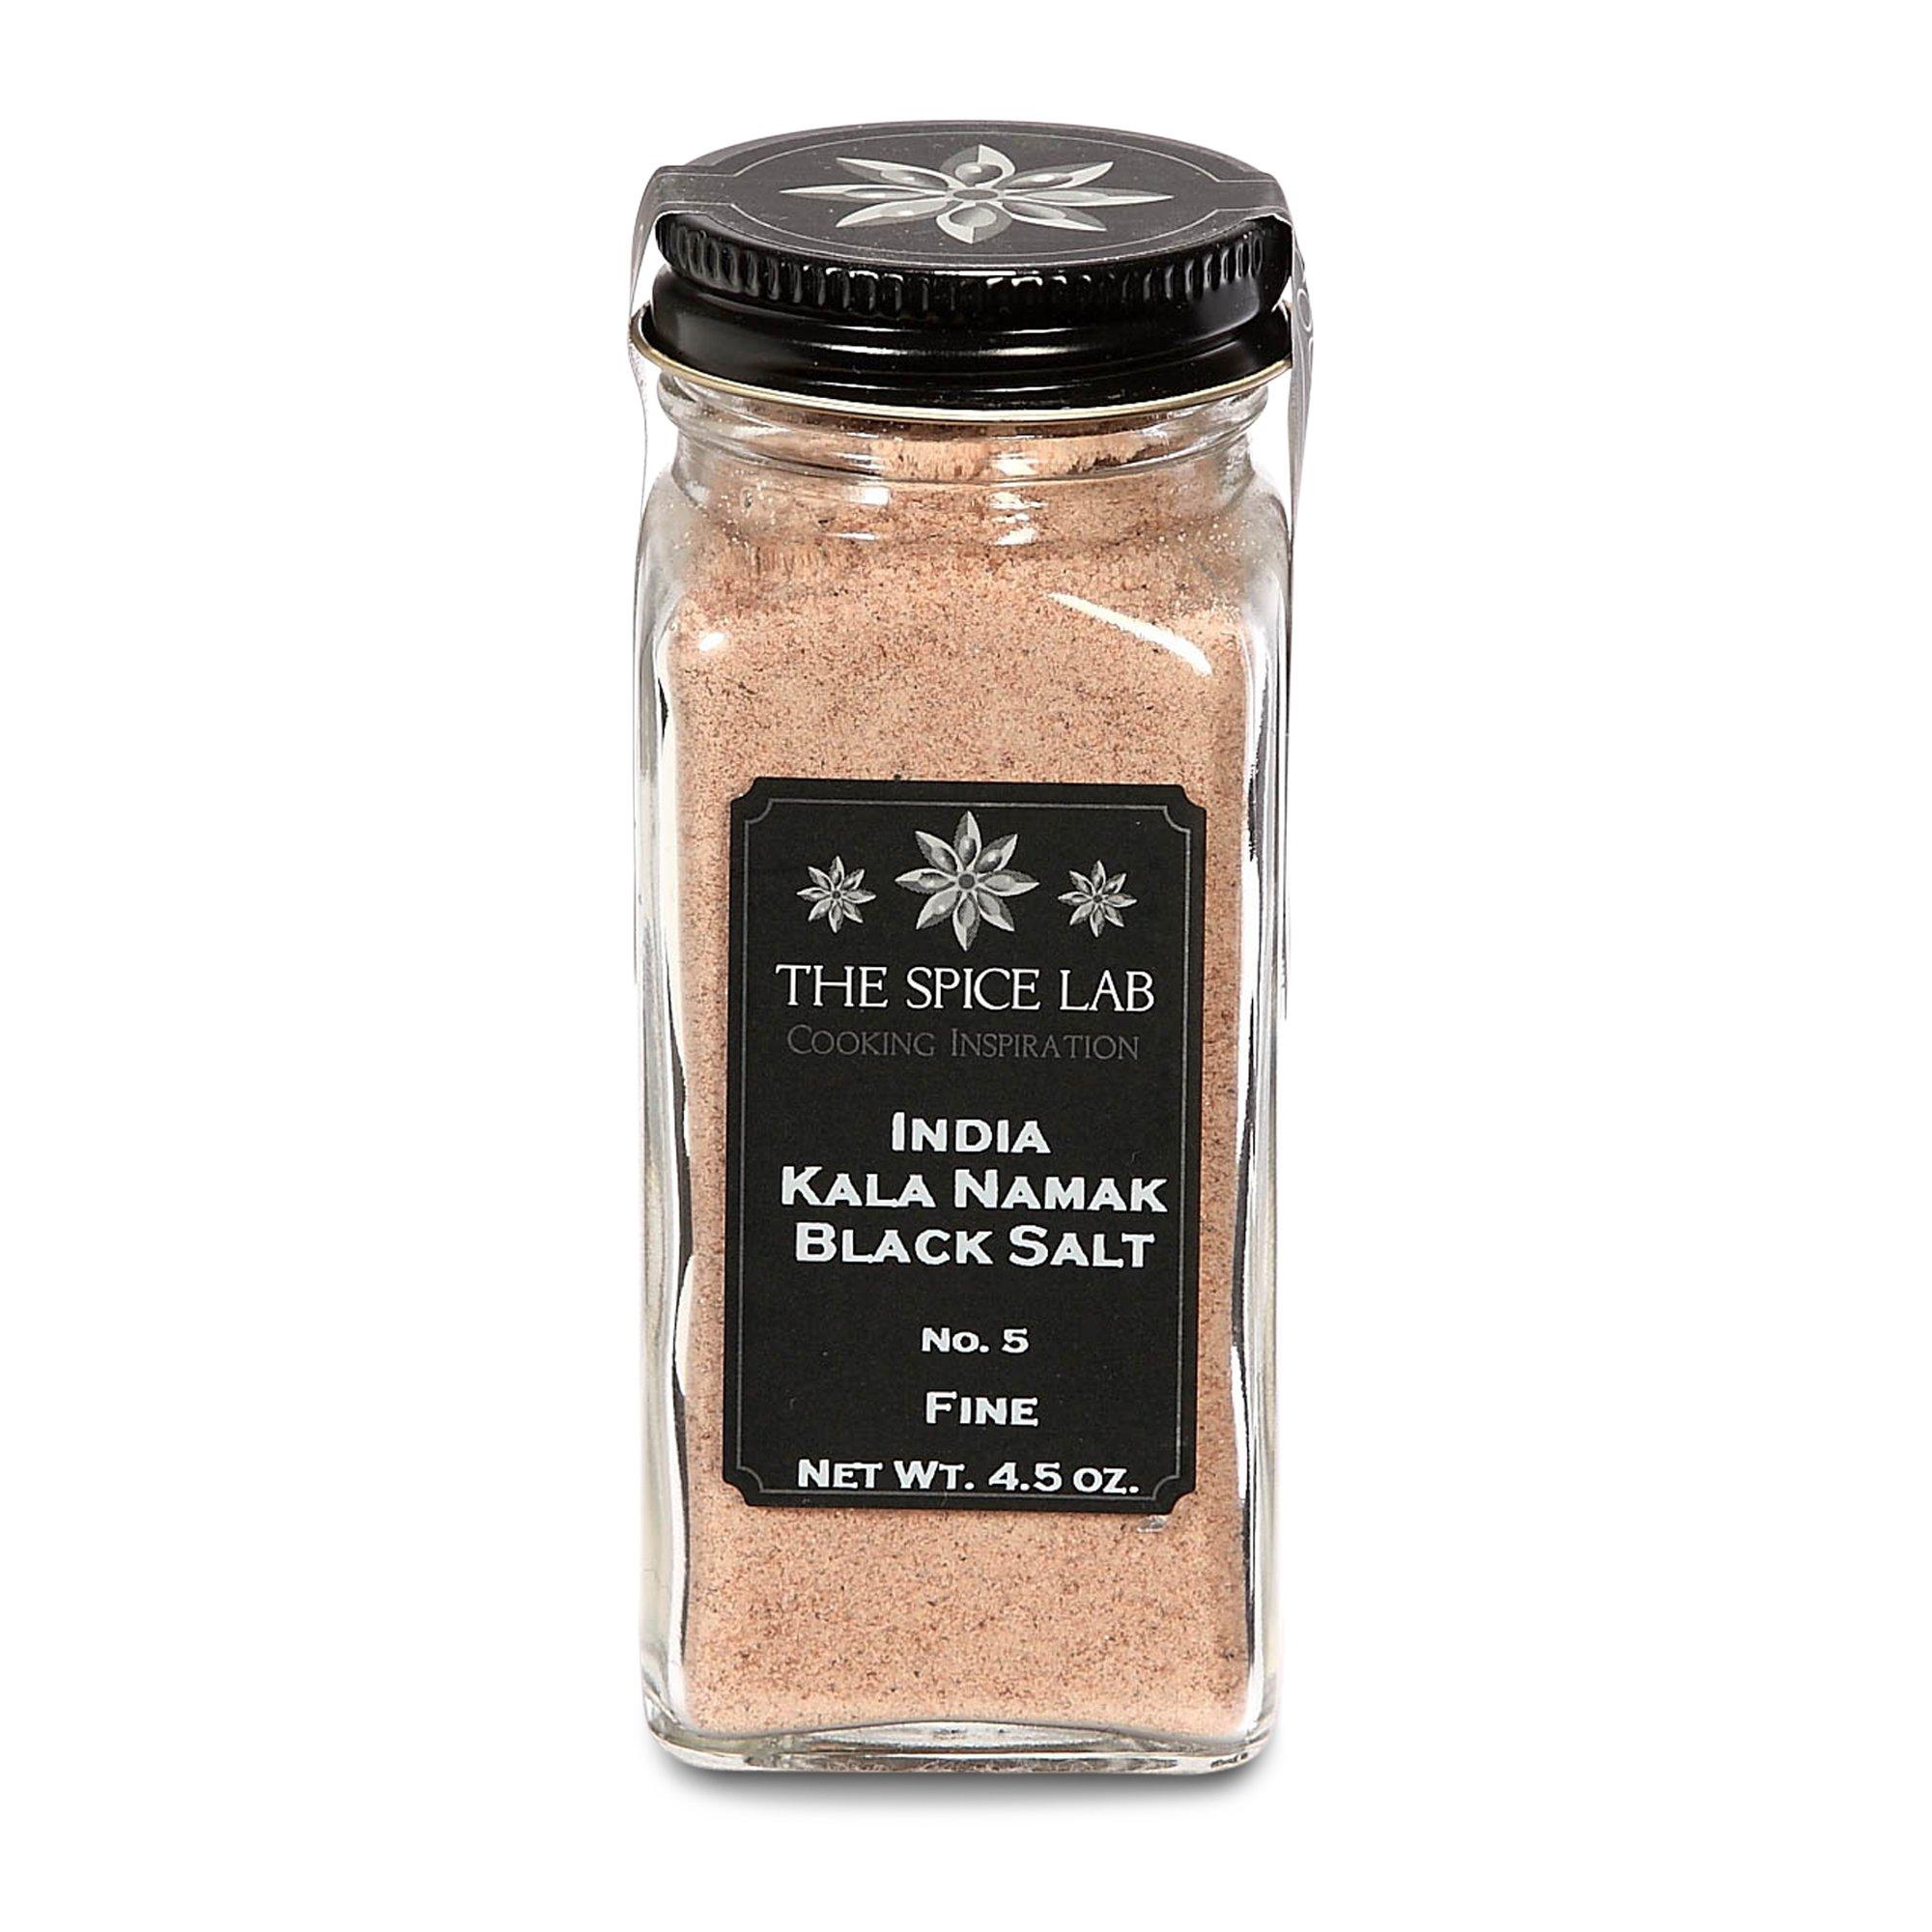 The Spice Lab Himalayan Black Crystal Indian Salt - Kala Namak Mineral - Fine Ground - French Jar